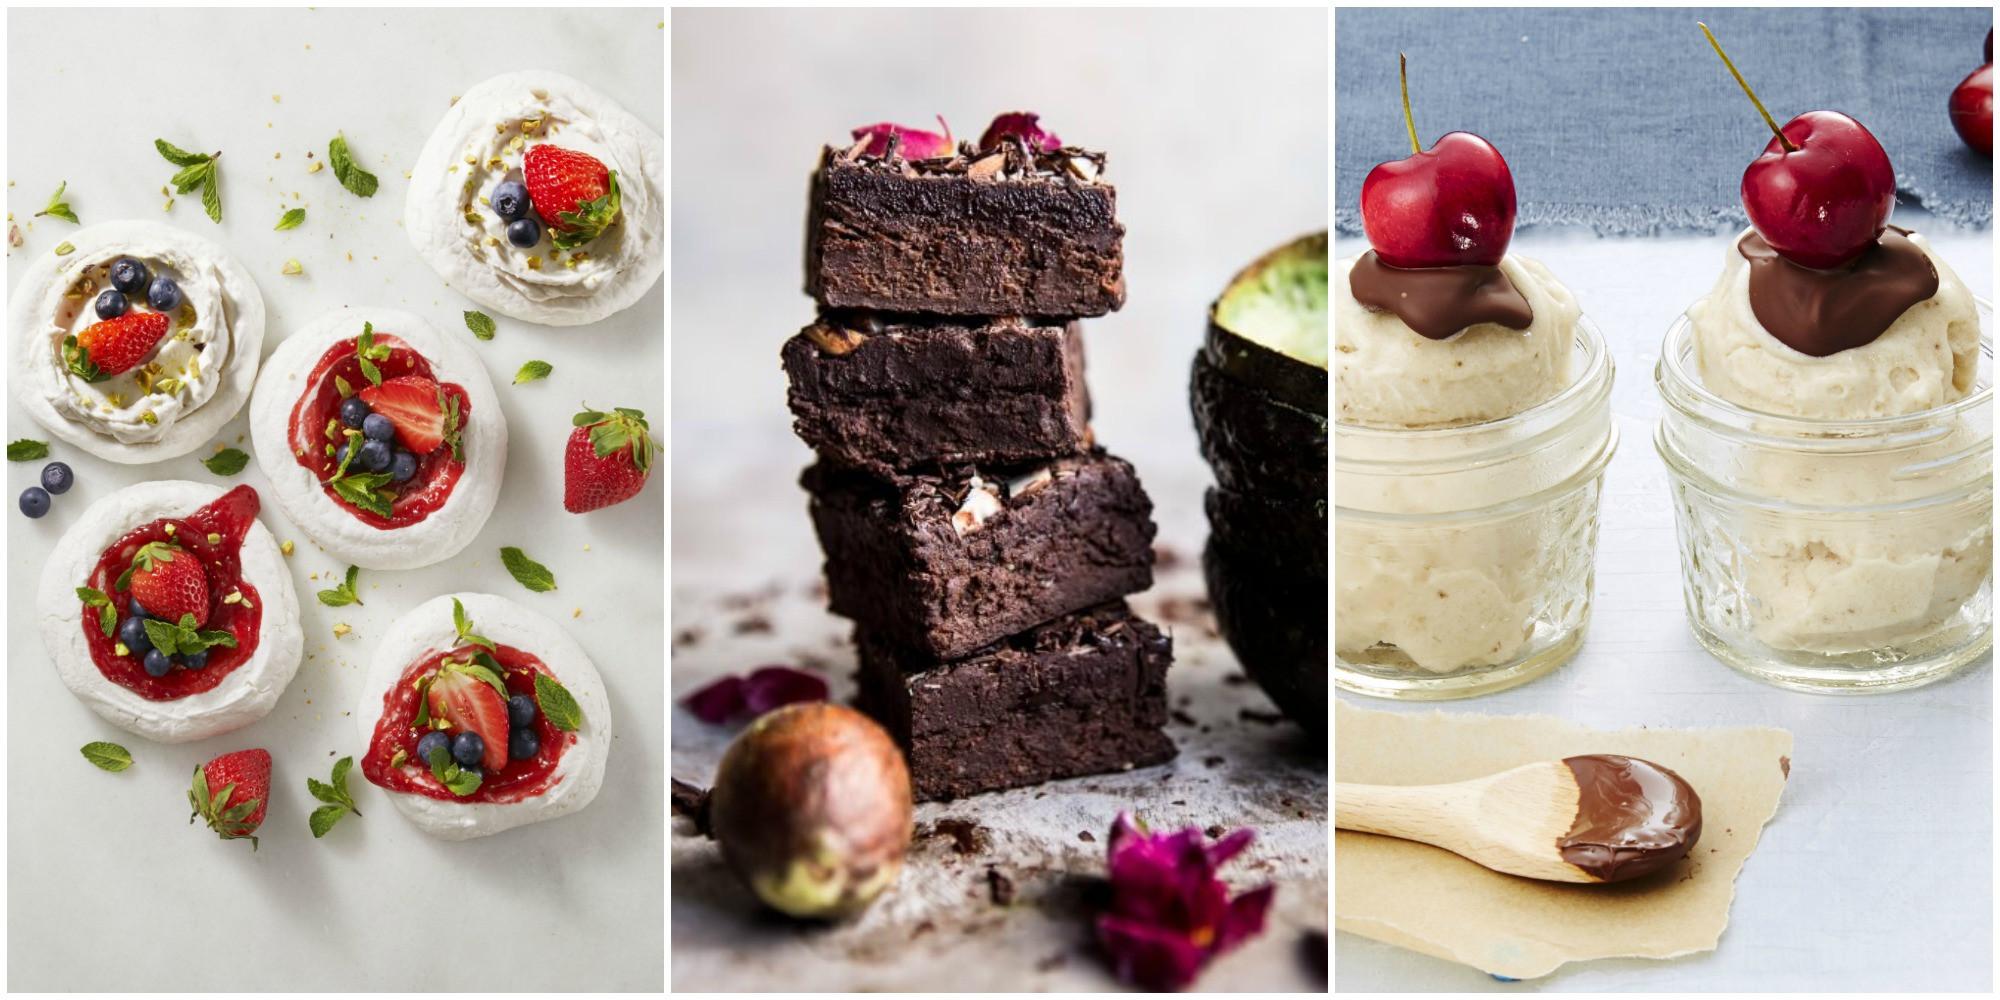 Healthy Dessert Ideas Easy  15 Best Healthy Dessert Recipes Easy Ideas for Low